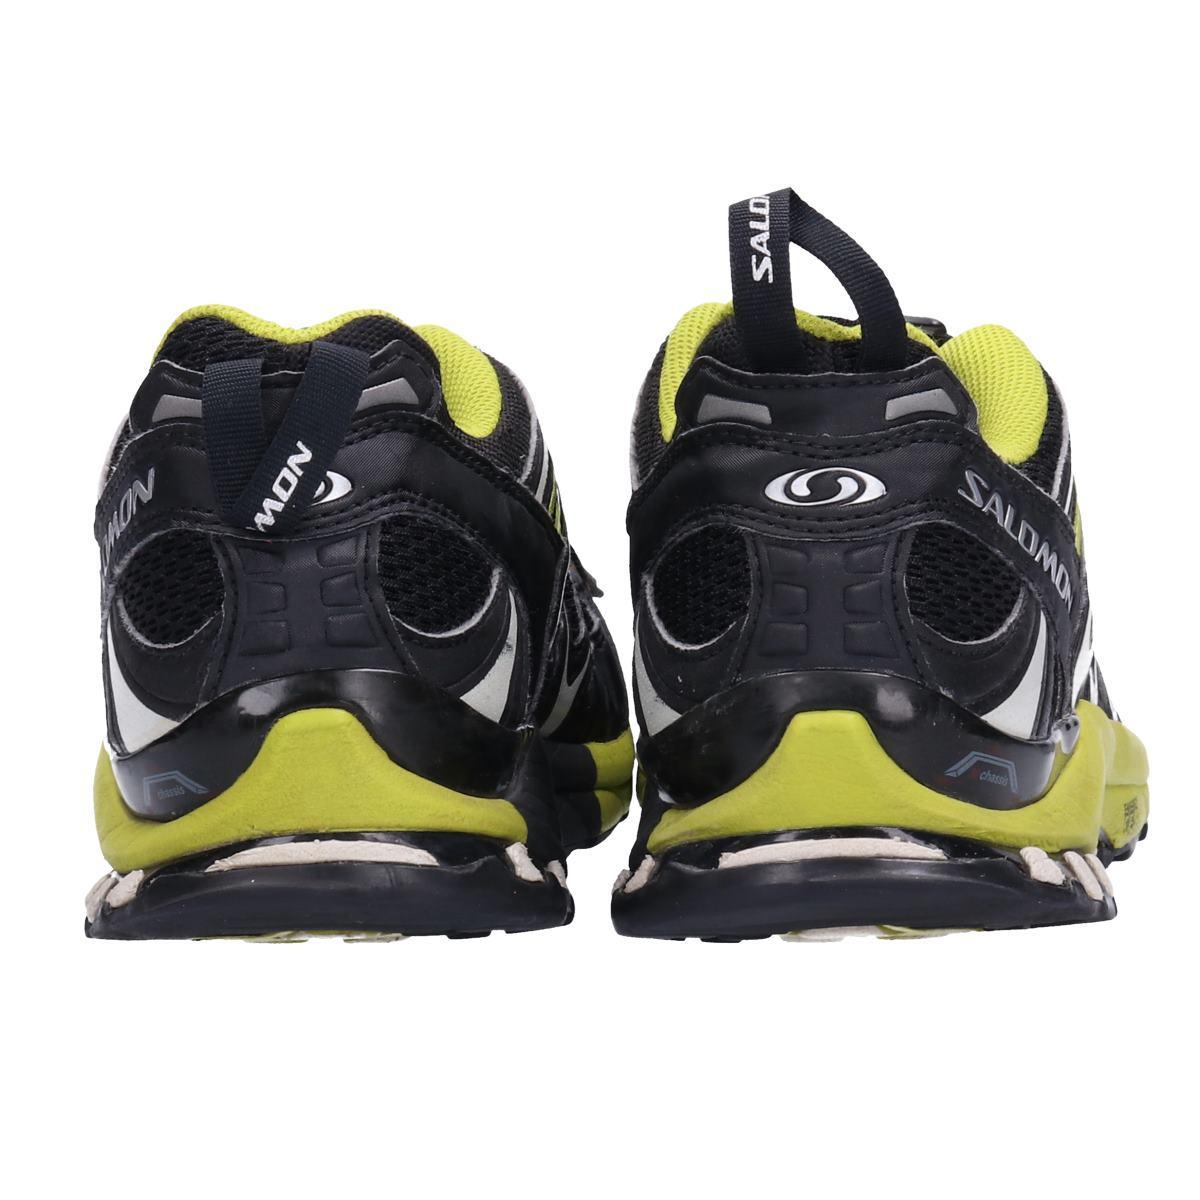 Salomon SALOMON XA PRO 3D ULTRA outdoor sneakers US9 men 27.0cm bop5026